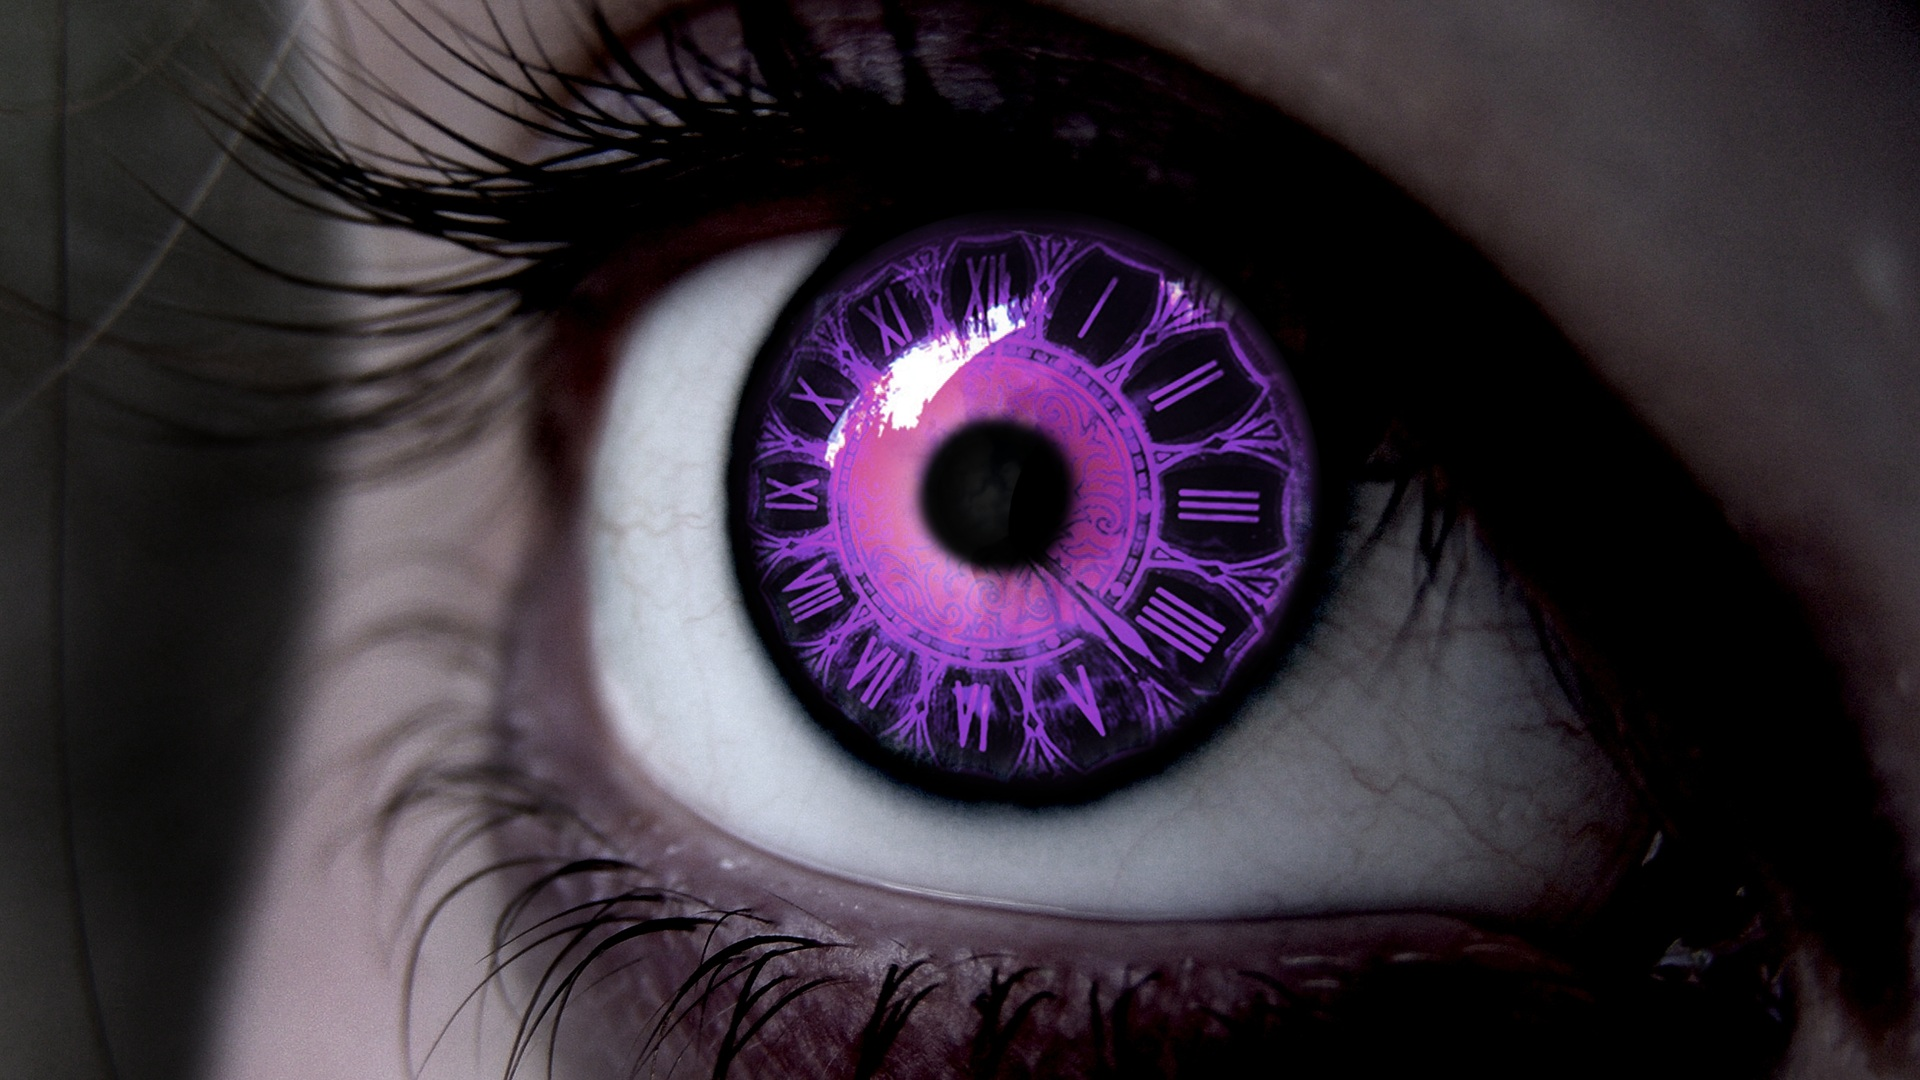 Purple eye clock hd wallpaper background image 1920x1080 id 684757 wallpaper abyss - Eye drawing wallpaper ...